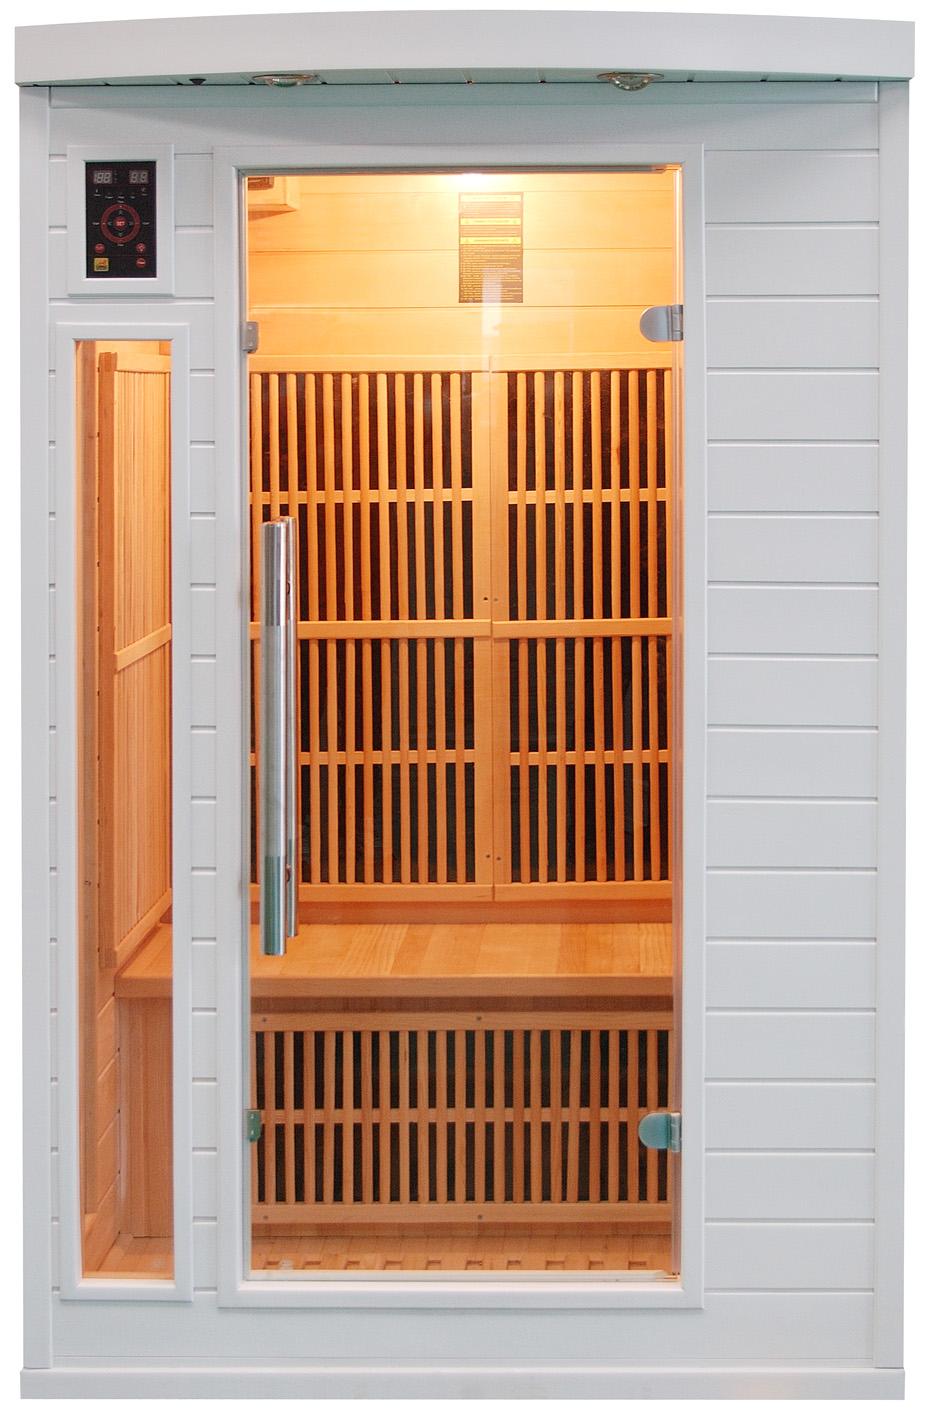 Sauna infrarrojos Soleil Blanc 2 Personas